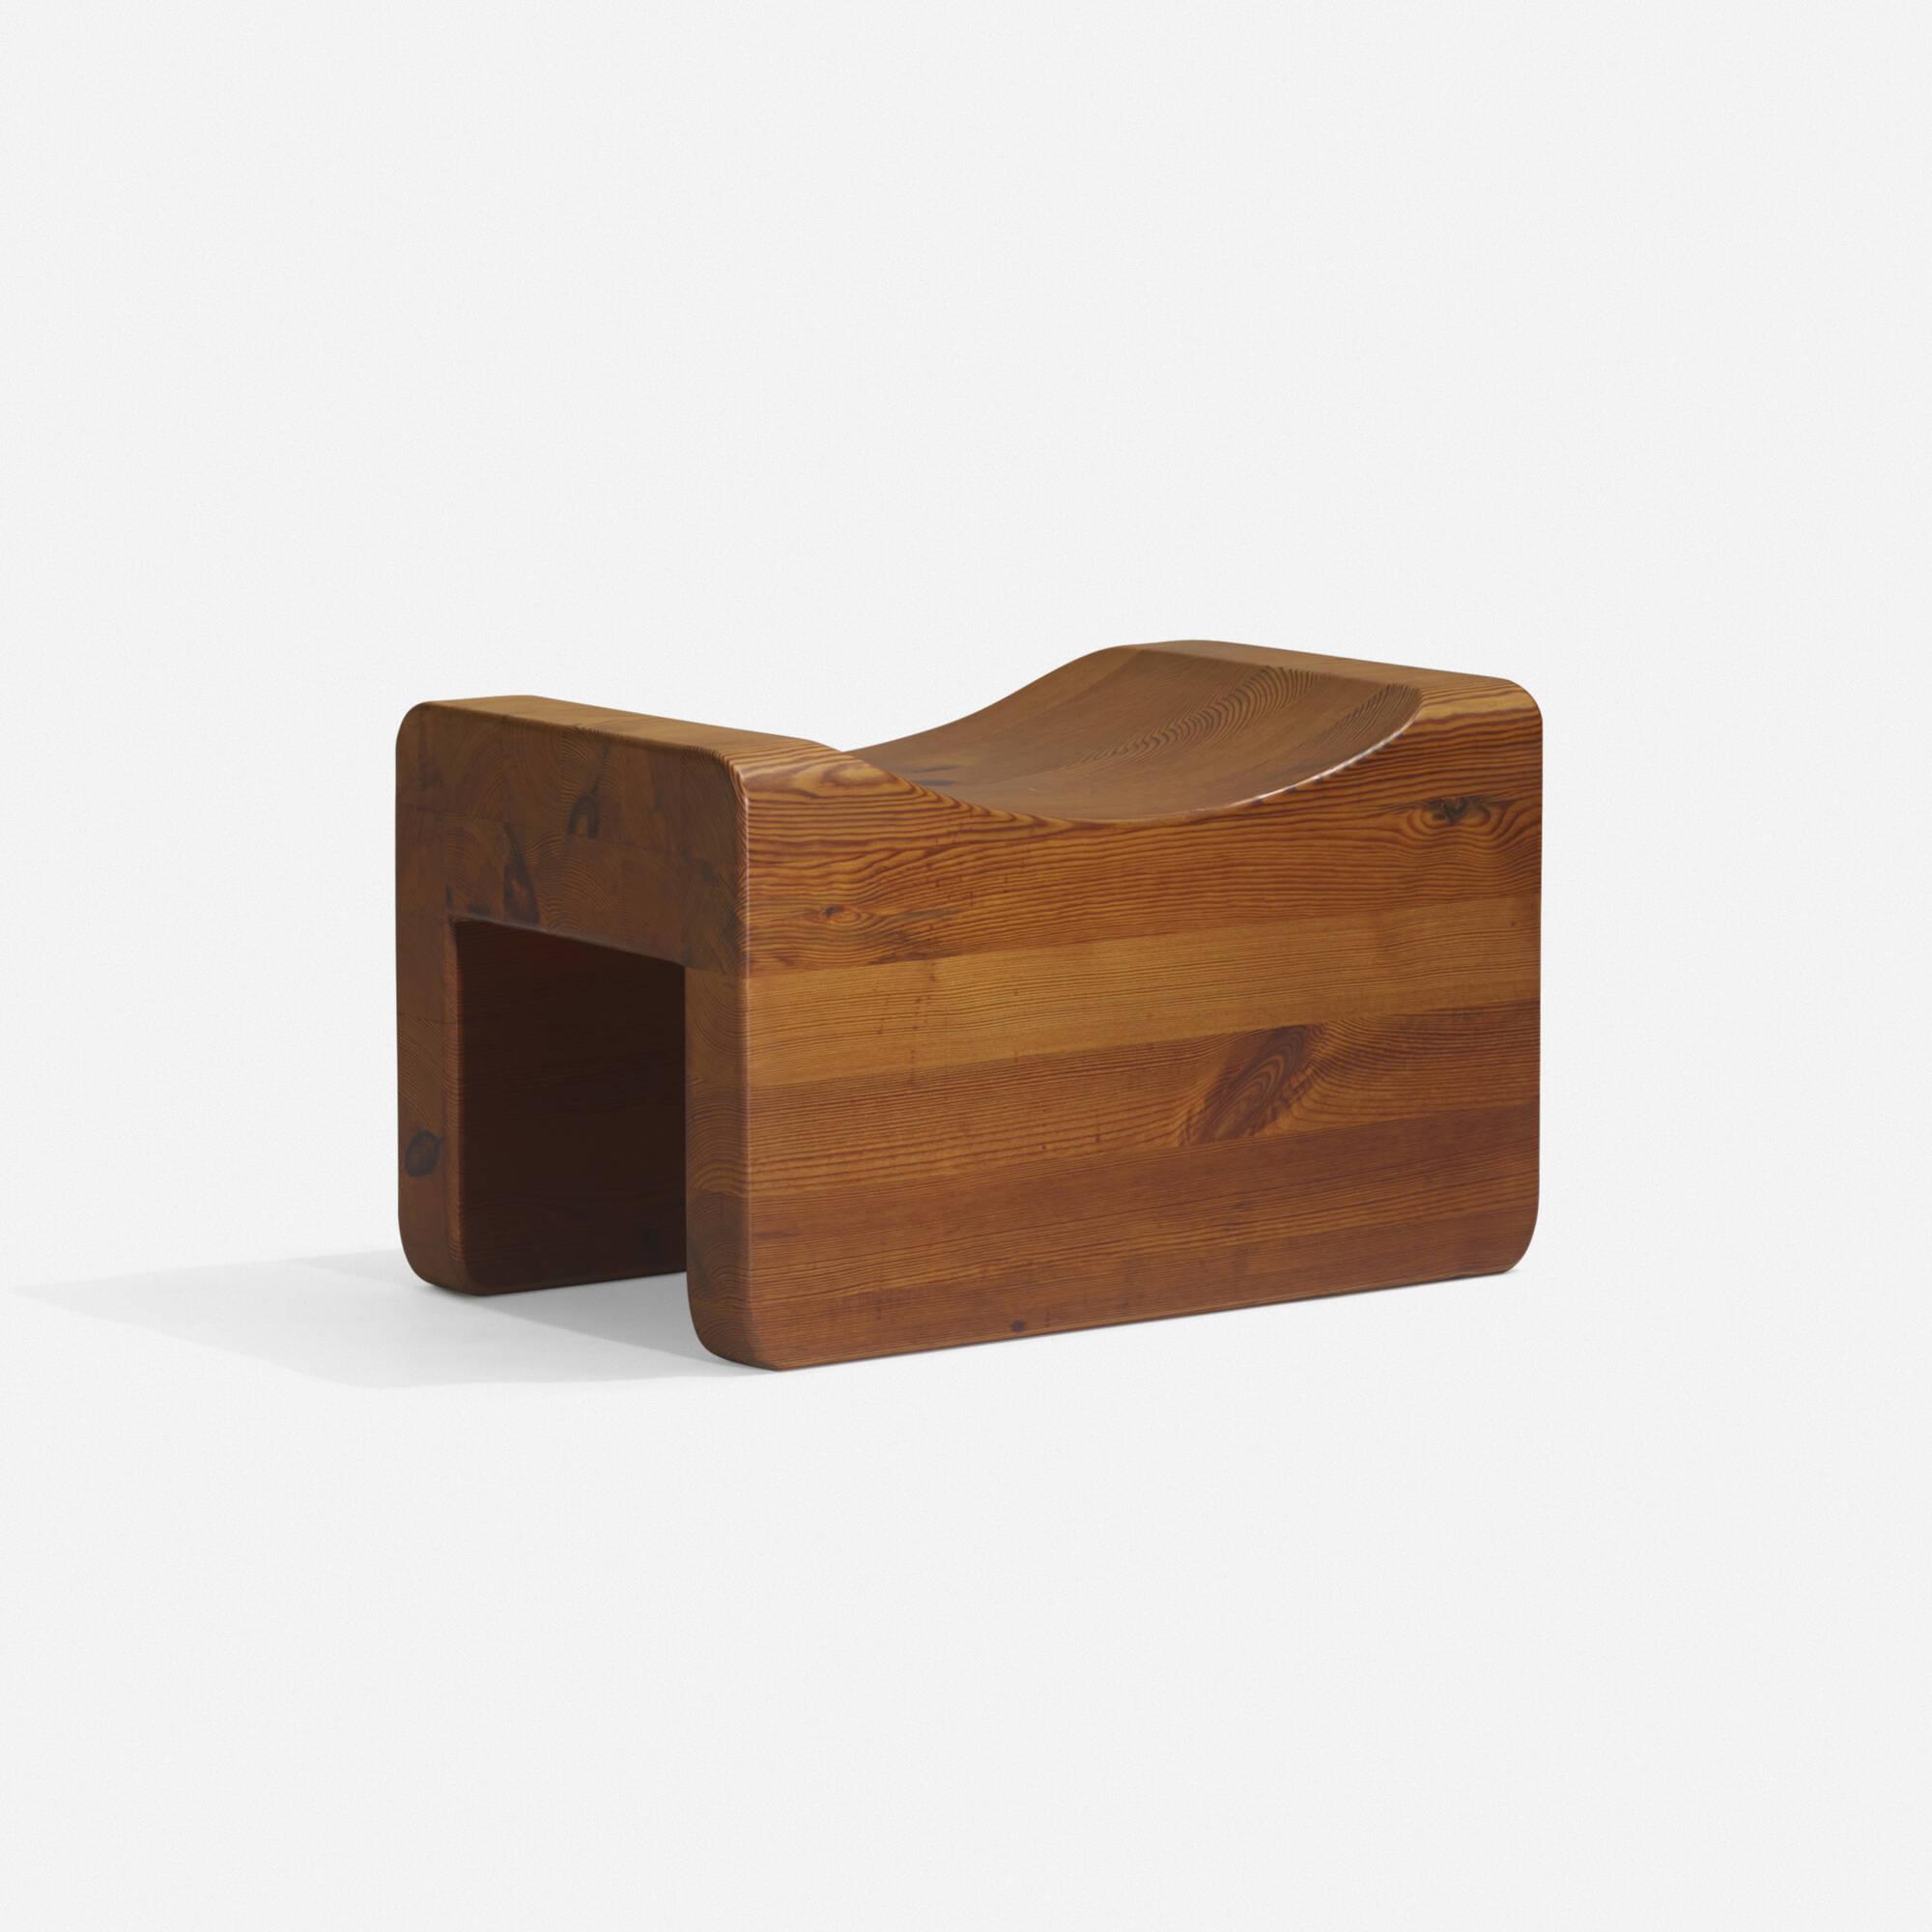 264: Axel Einar Hjorth / Uto stool (1 of 2)